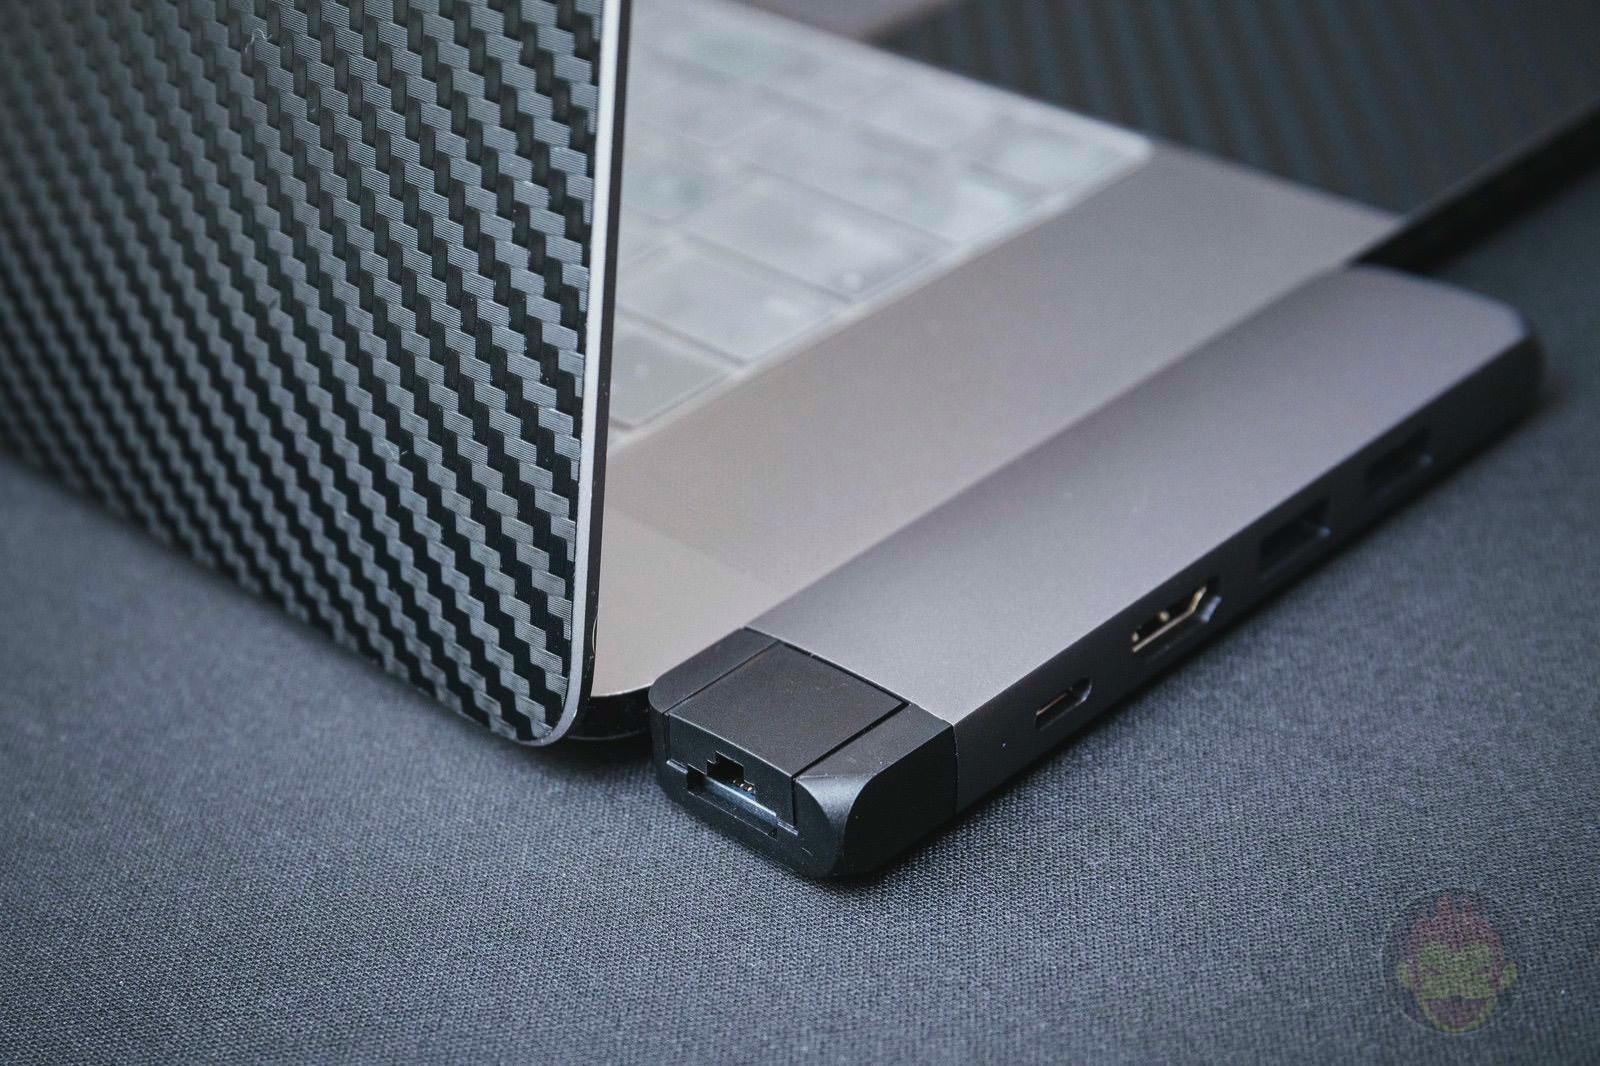 Satechi-Aluminum-Type-c-Pro-Hub-03.jpg